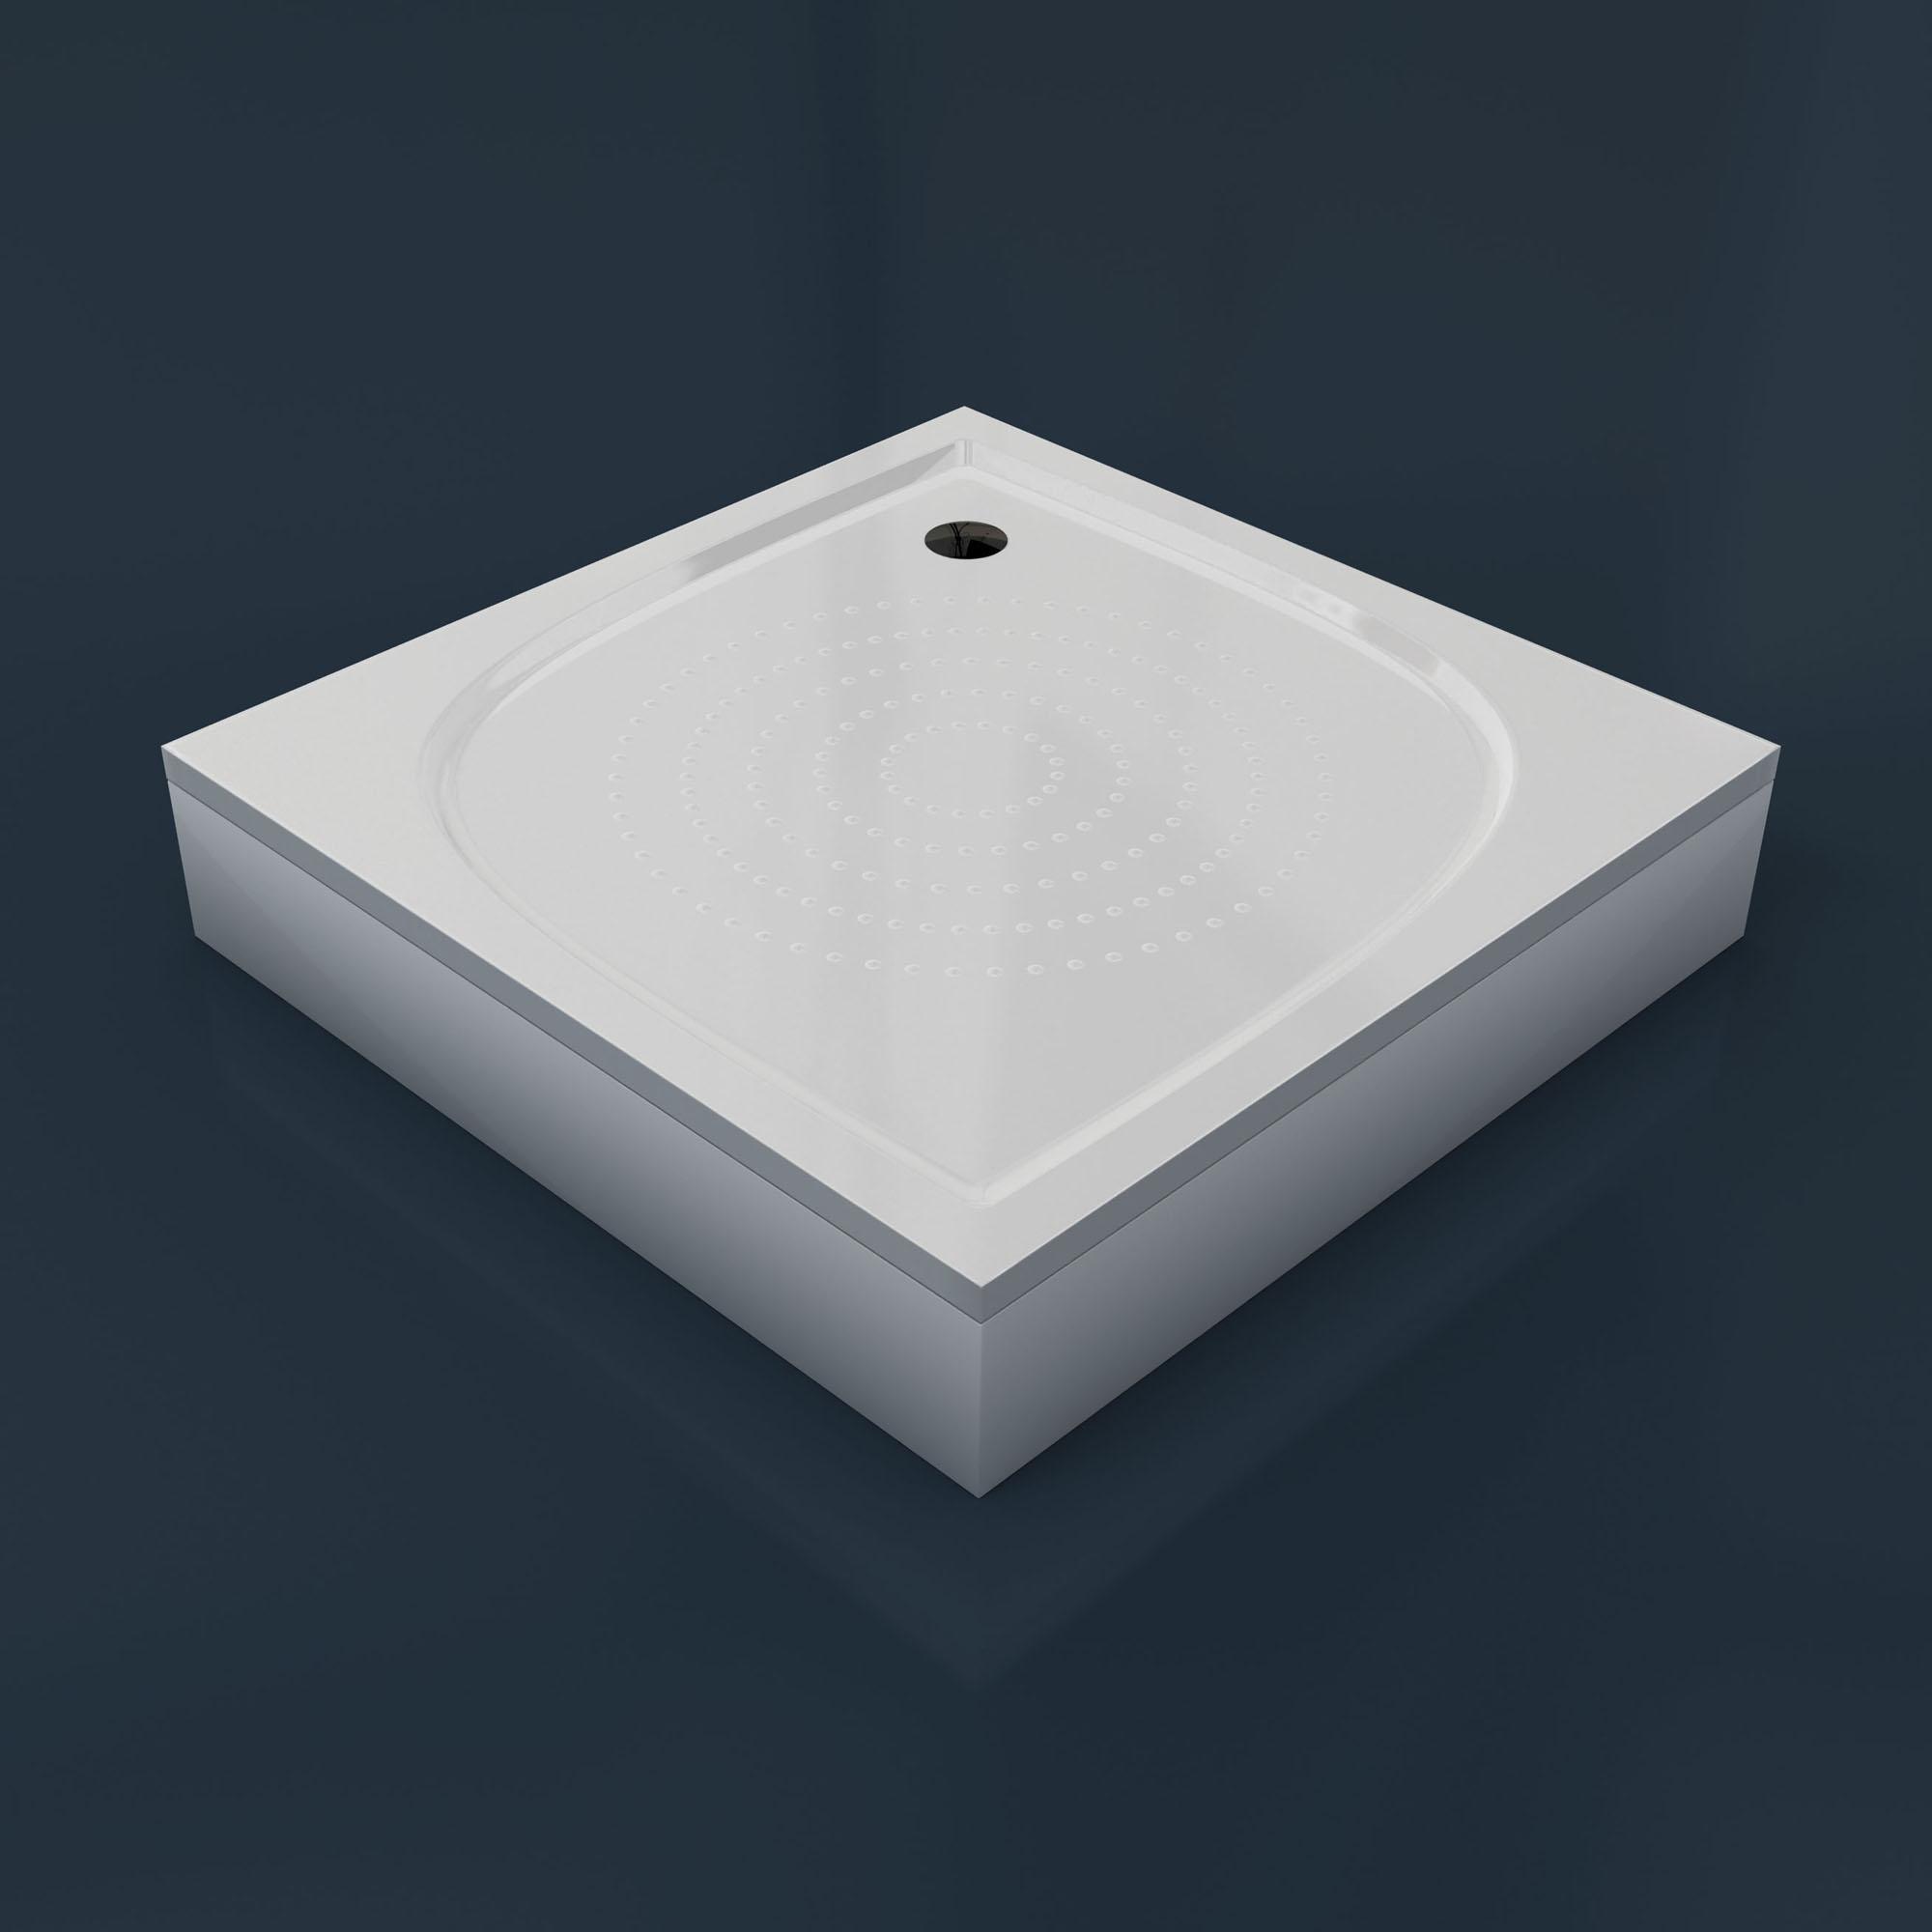 Душевой поддон Esse KK 90 душевой трап pestan square 3 150 мм 13000007